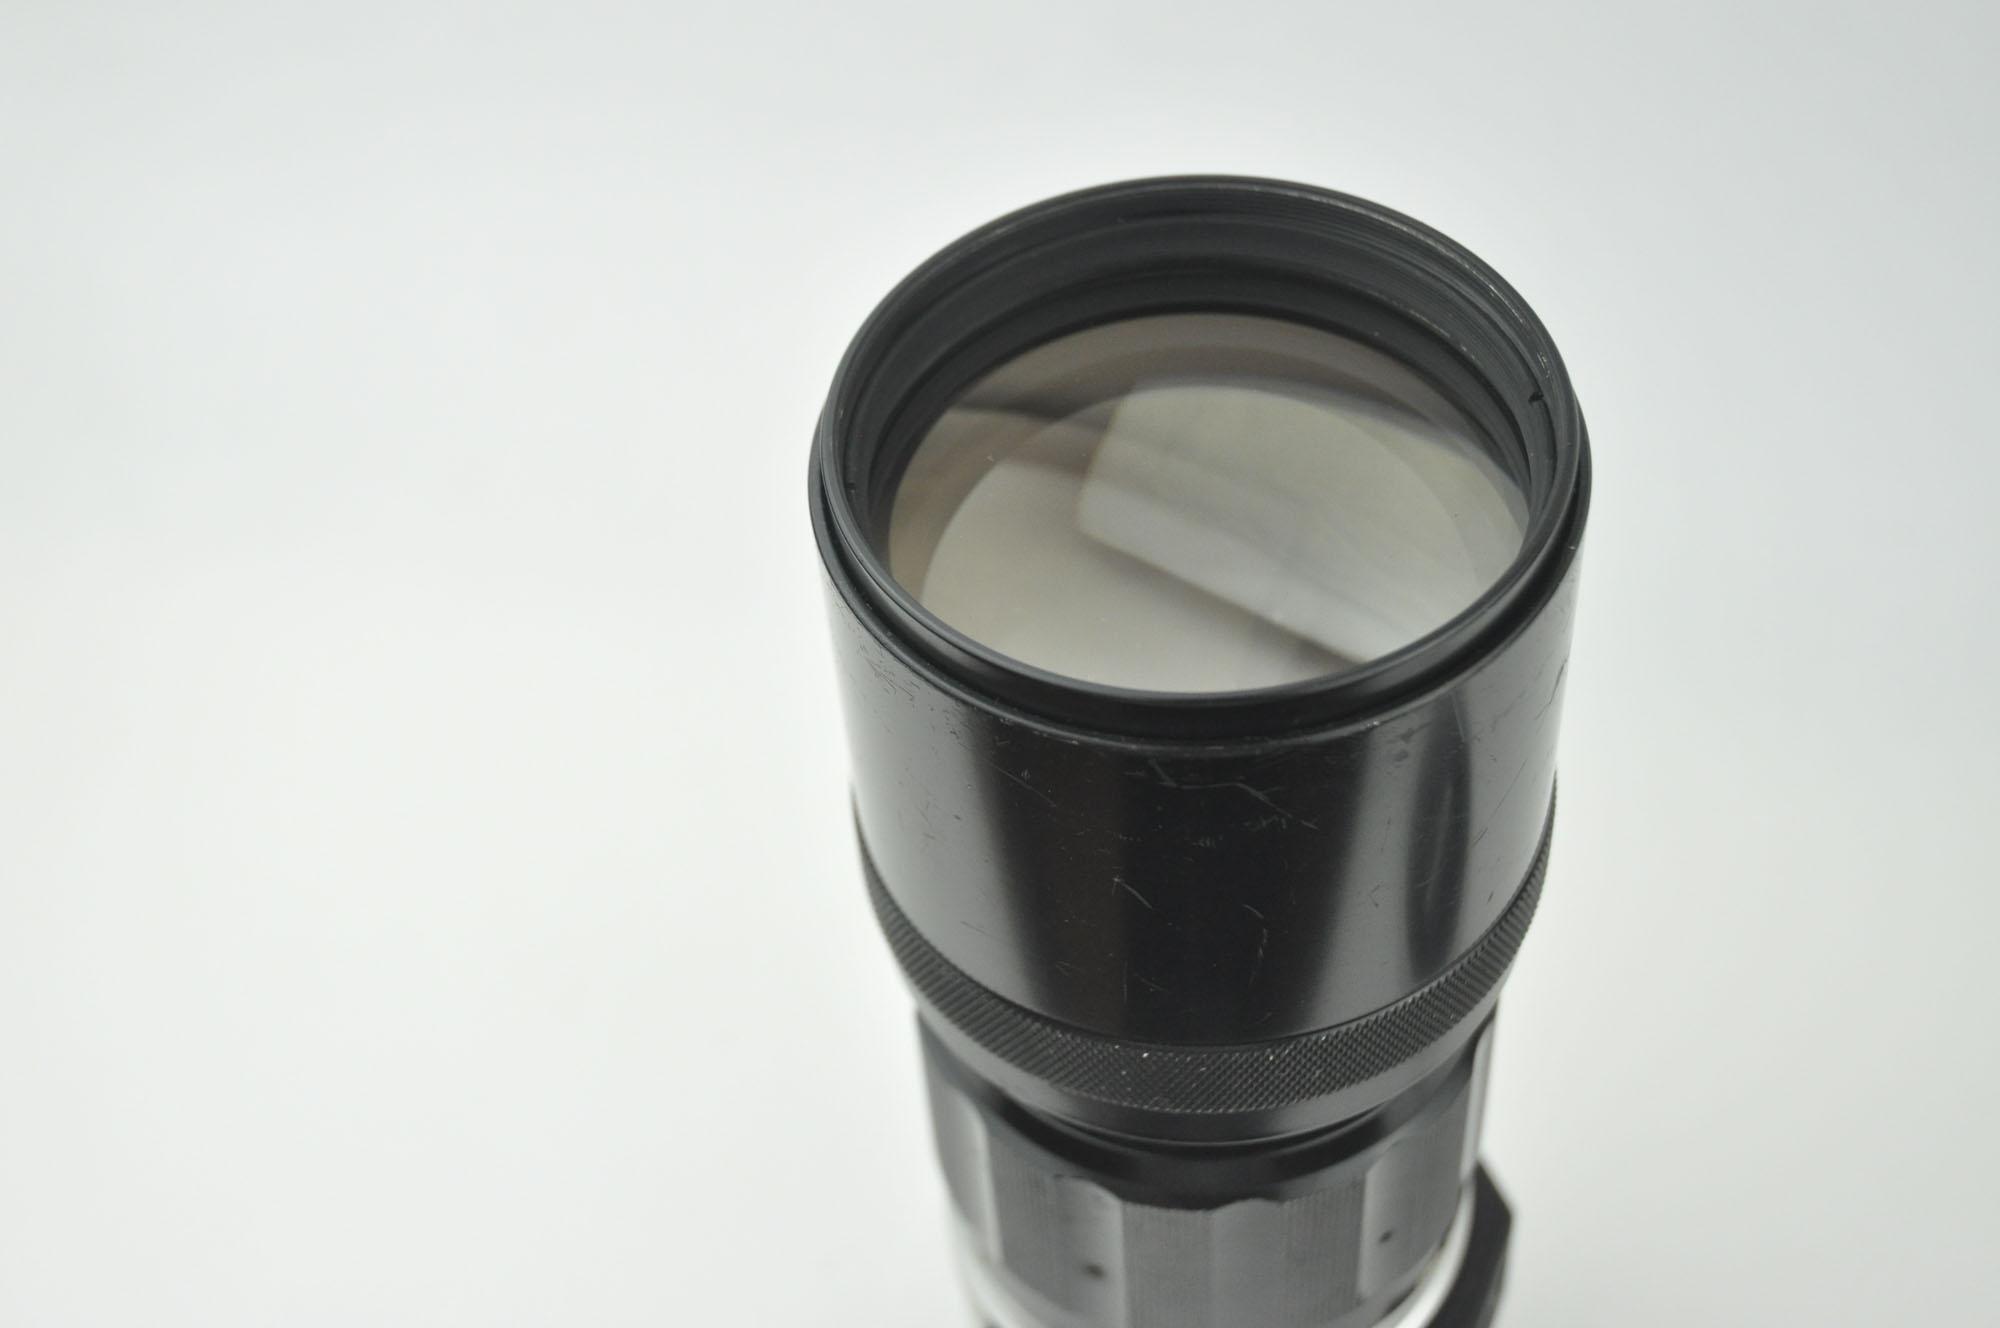 NIKKOR-H Auto 300mm f4.5 Ai